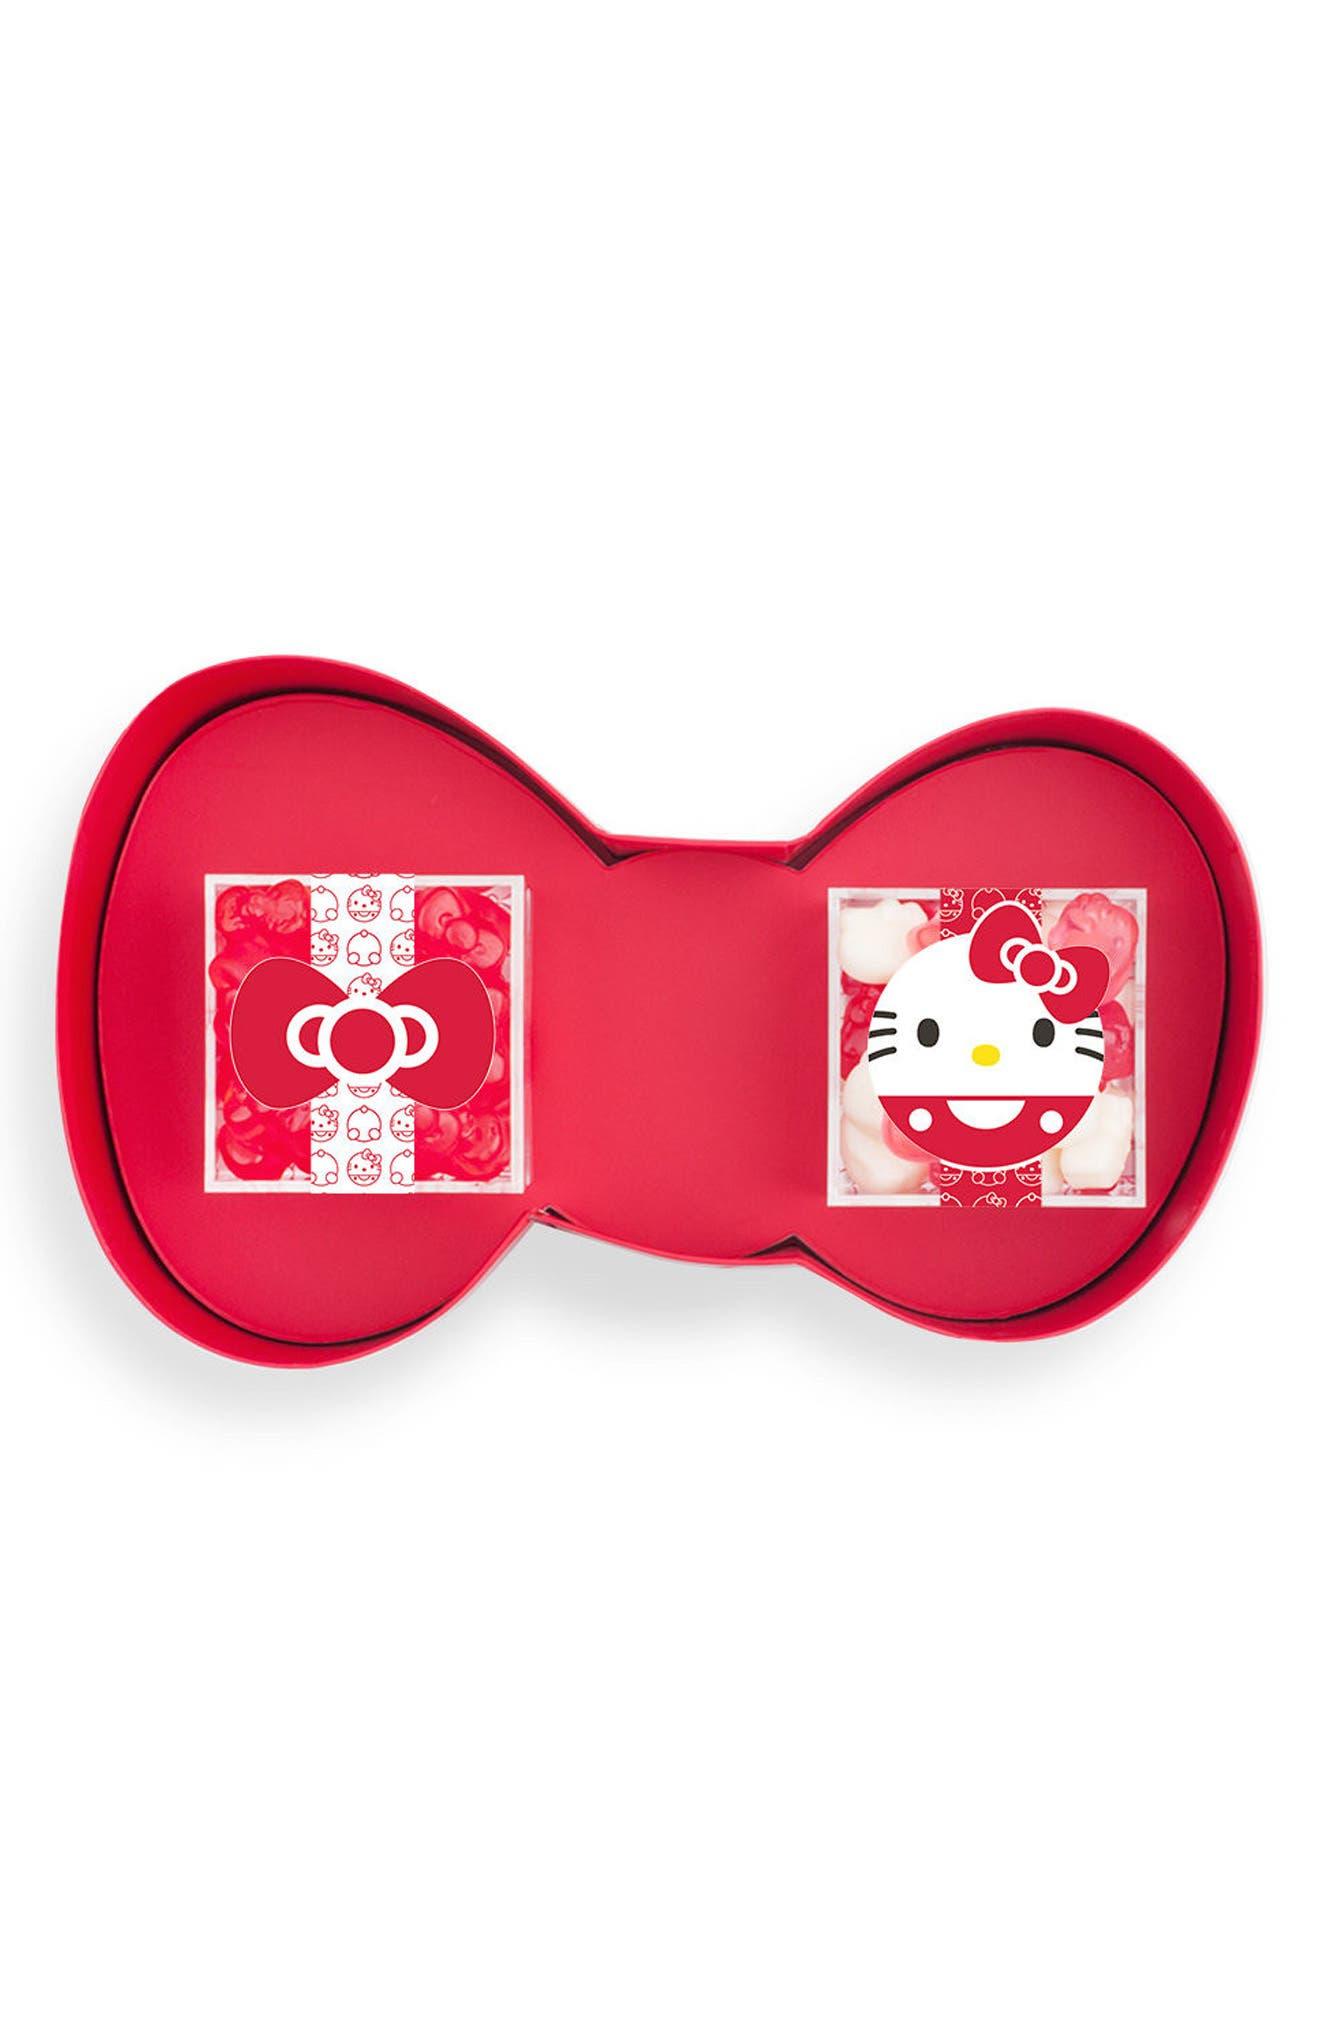 Main Image - sugarfina Hello Kitty® 2-Piece Gummy Candy Bento Box